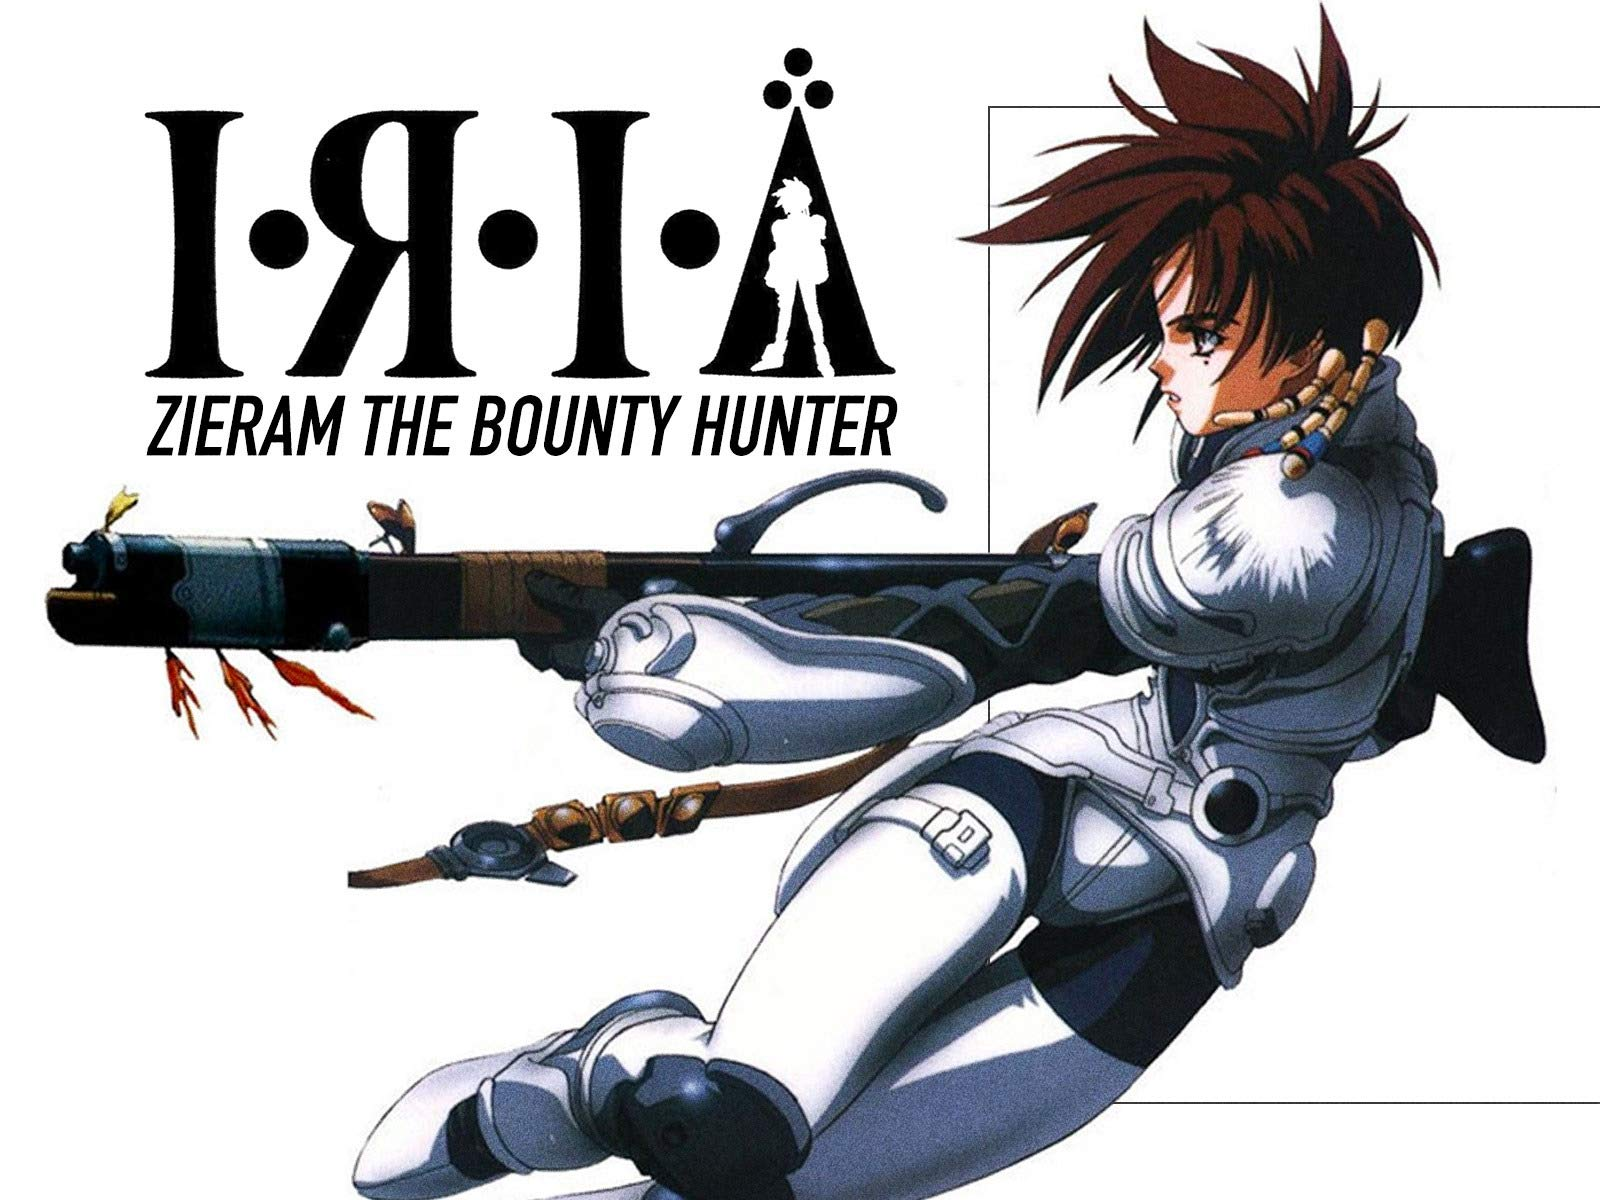 Amazon.com: Watch Iria: Zeiram The Bounty Hunter | Prime Video